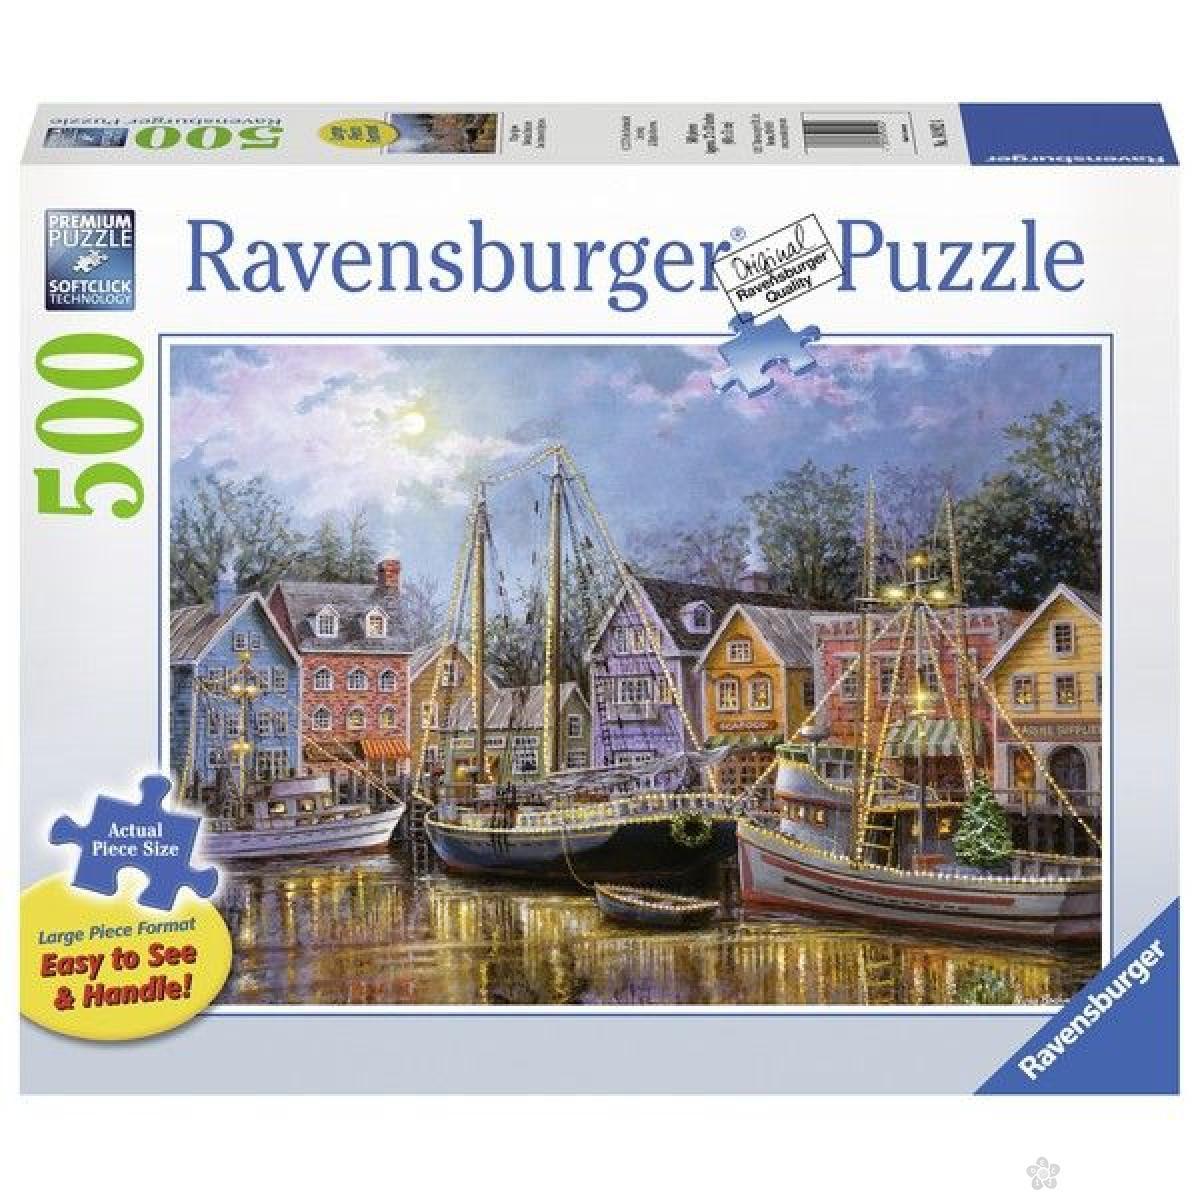 Ravensburger puzzle (slagalice) - Usidreni brodovi RA14912